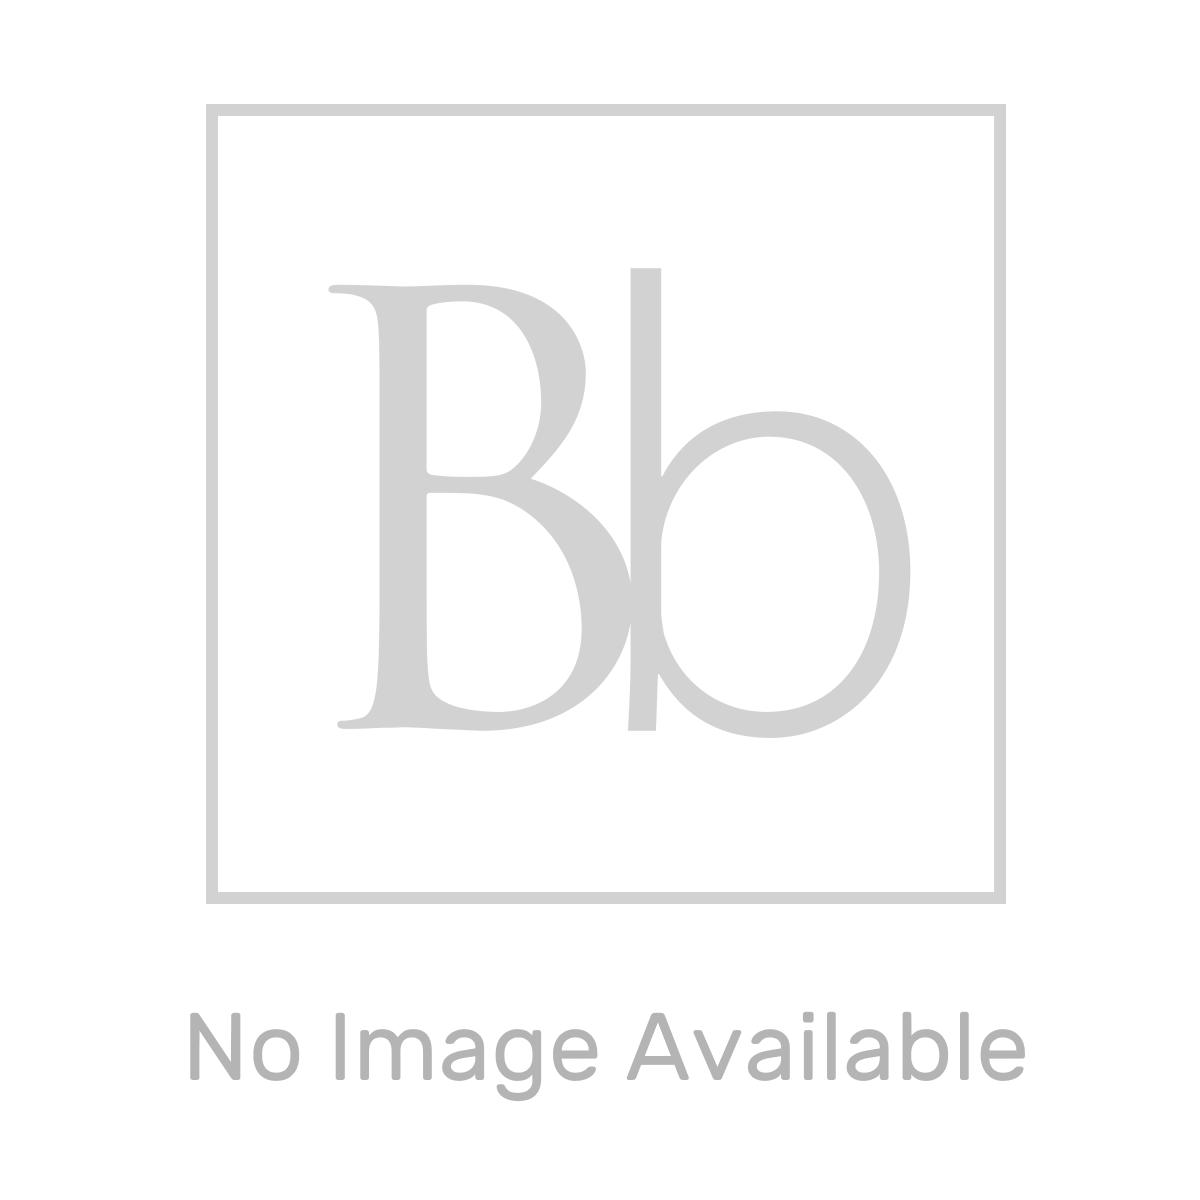 Kartell K-vit White G4K Contract Bath 1400mm x 700mm